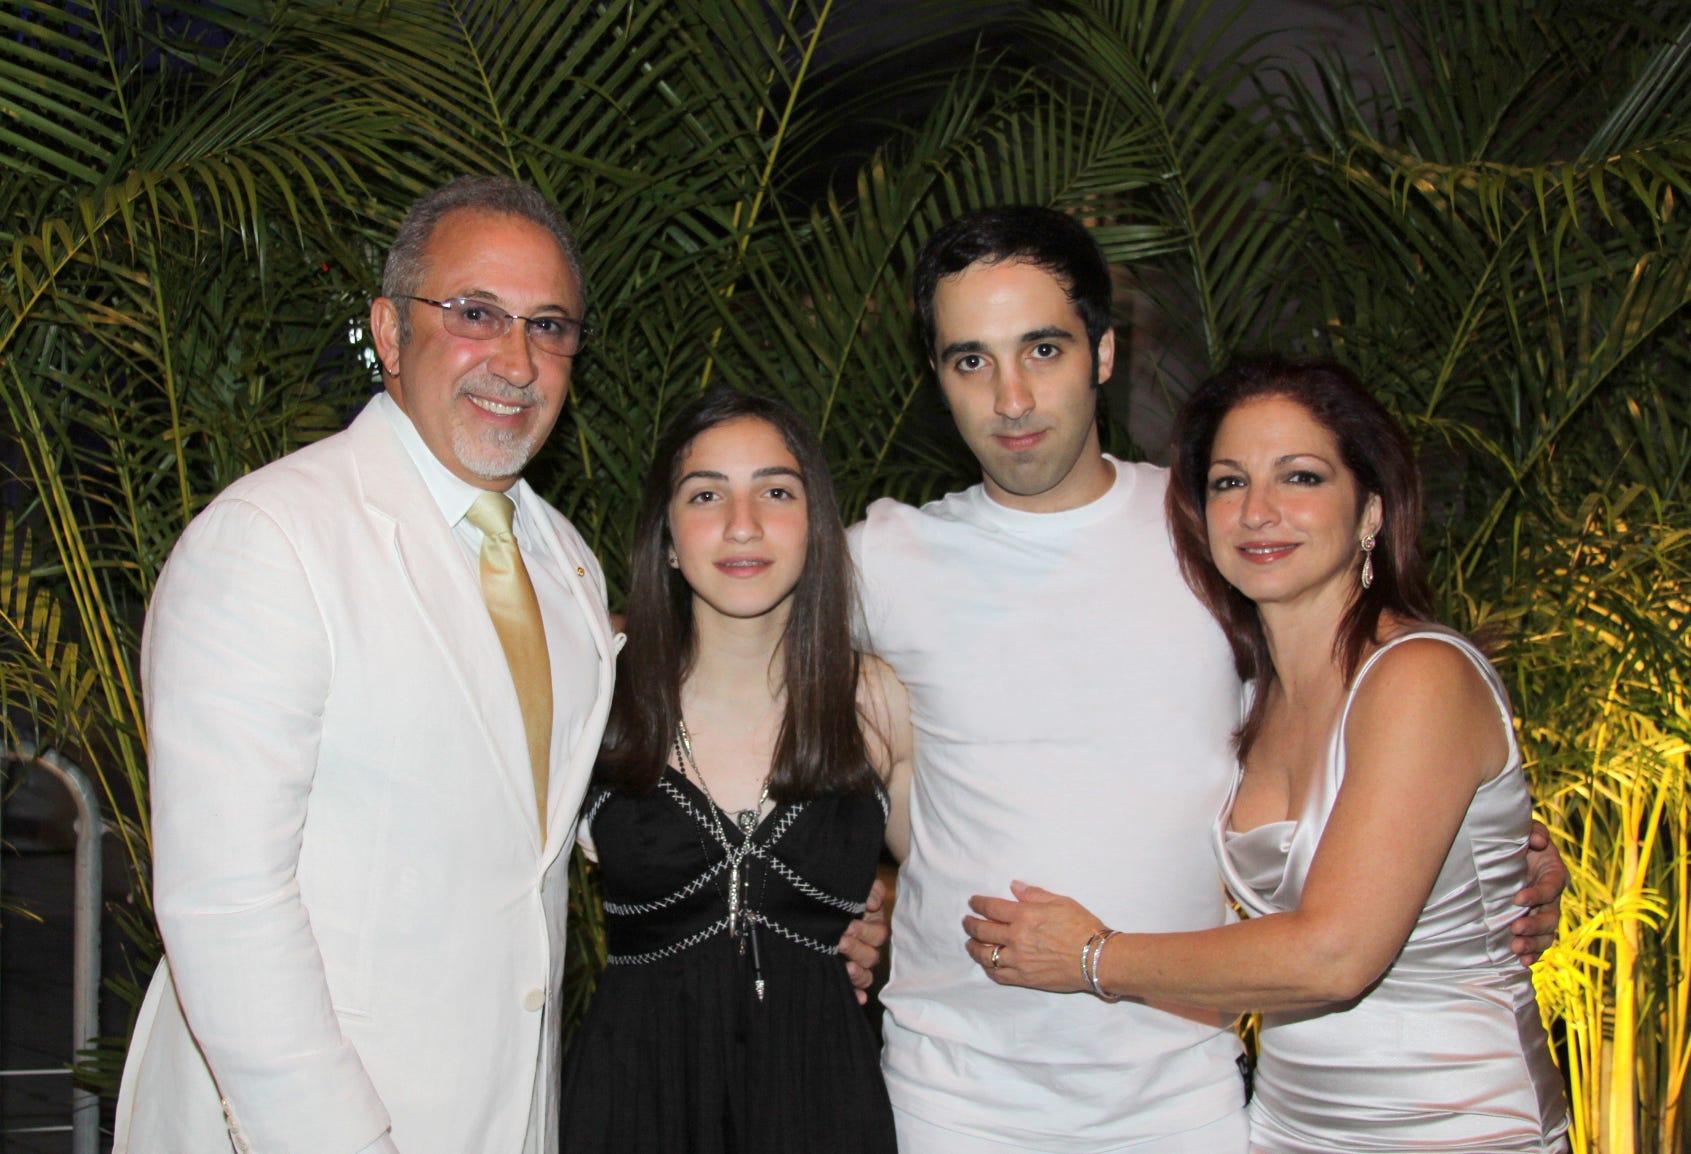 Emilio and Gloria Estefan with their children, Emily and Nayib.